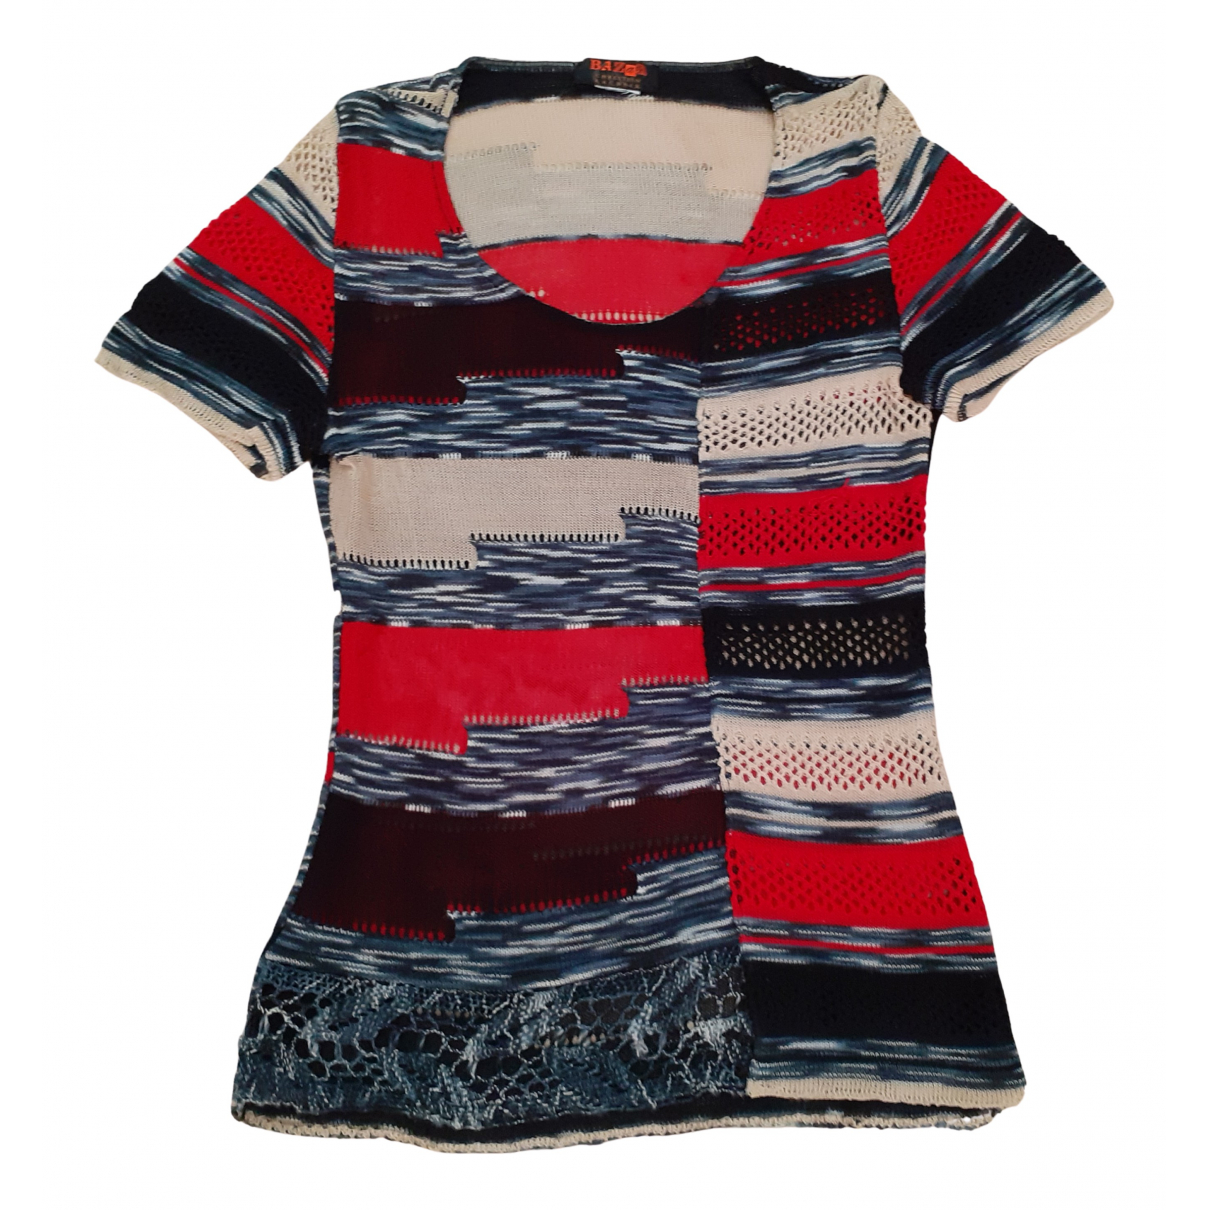 Camiseta de Lino Christian Lacroix